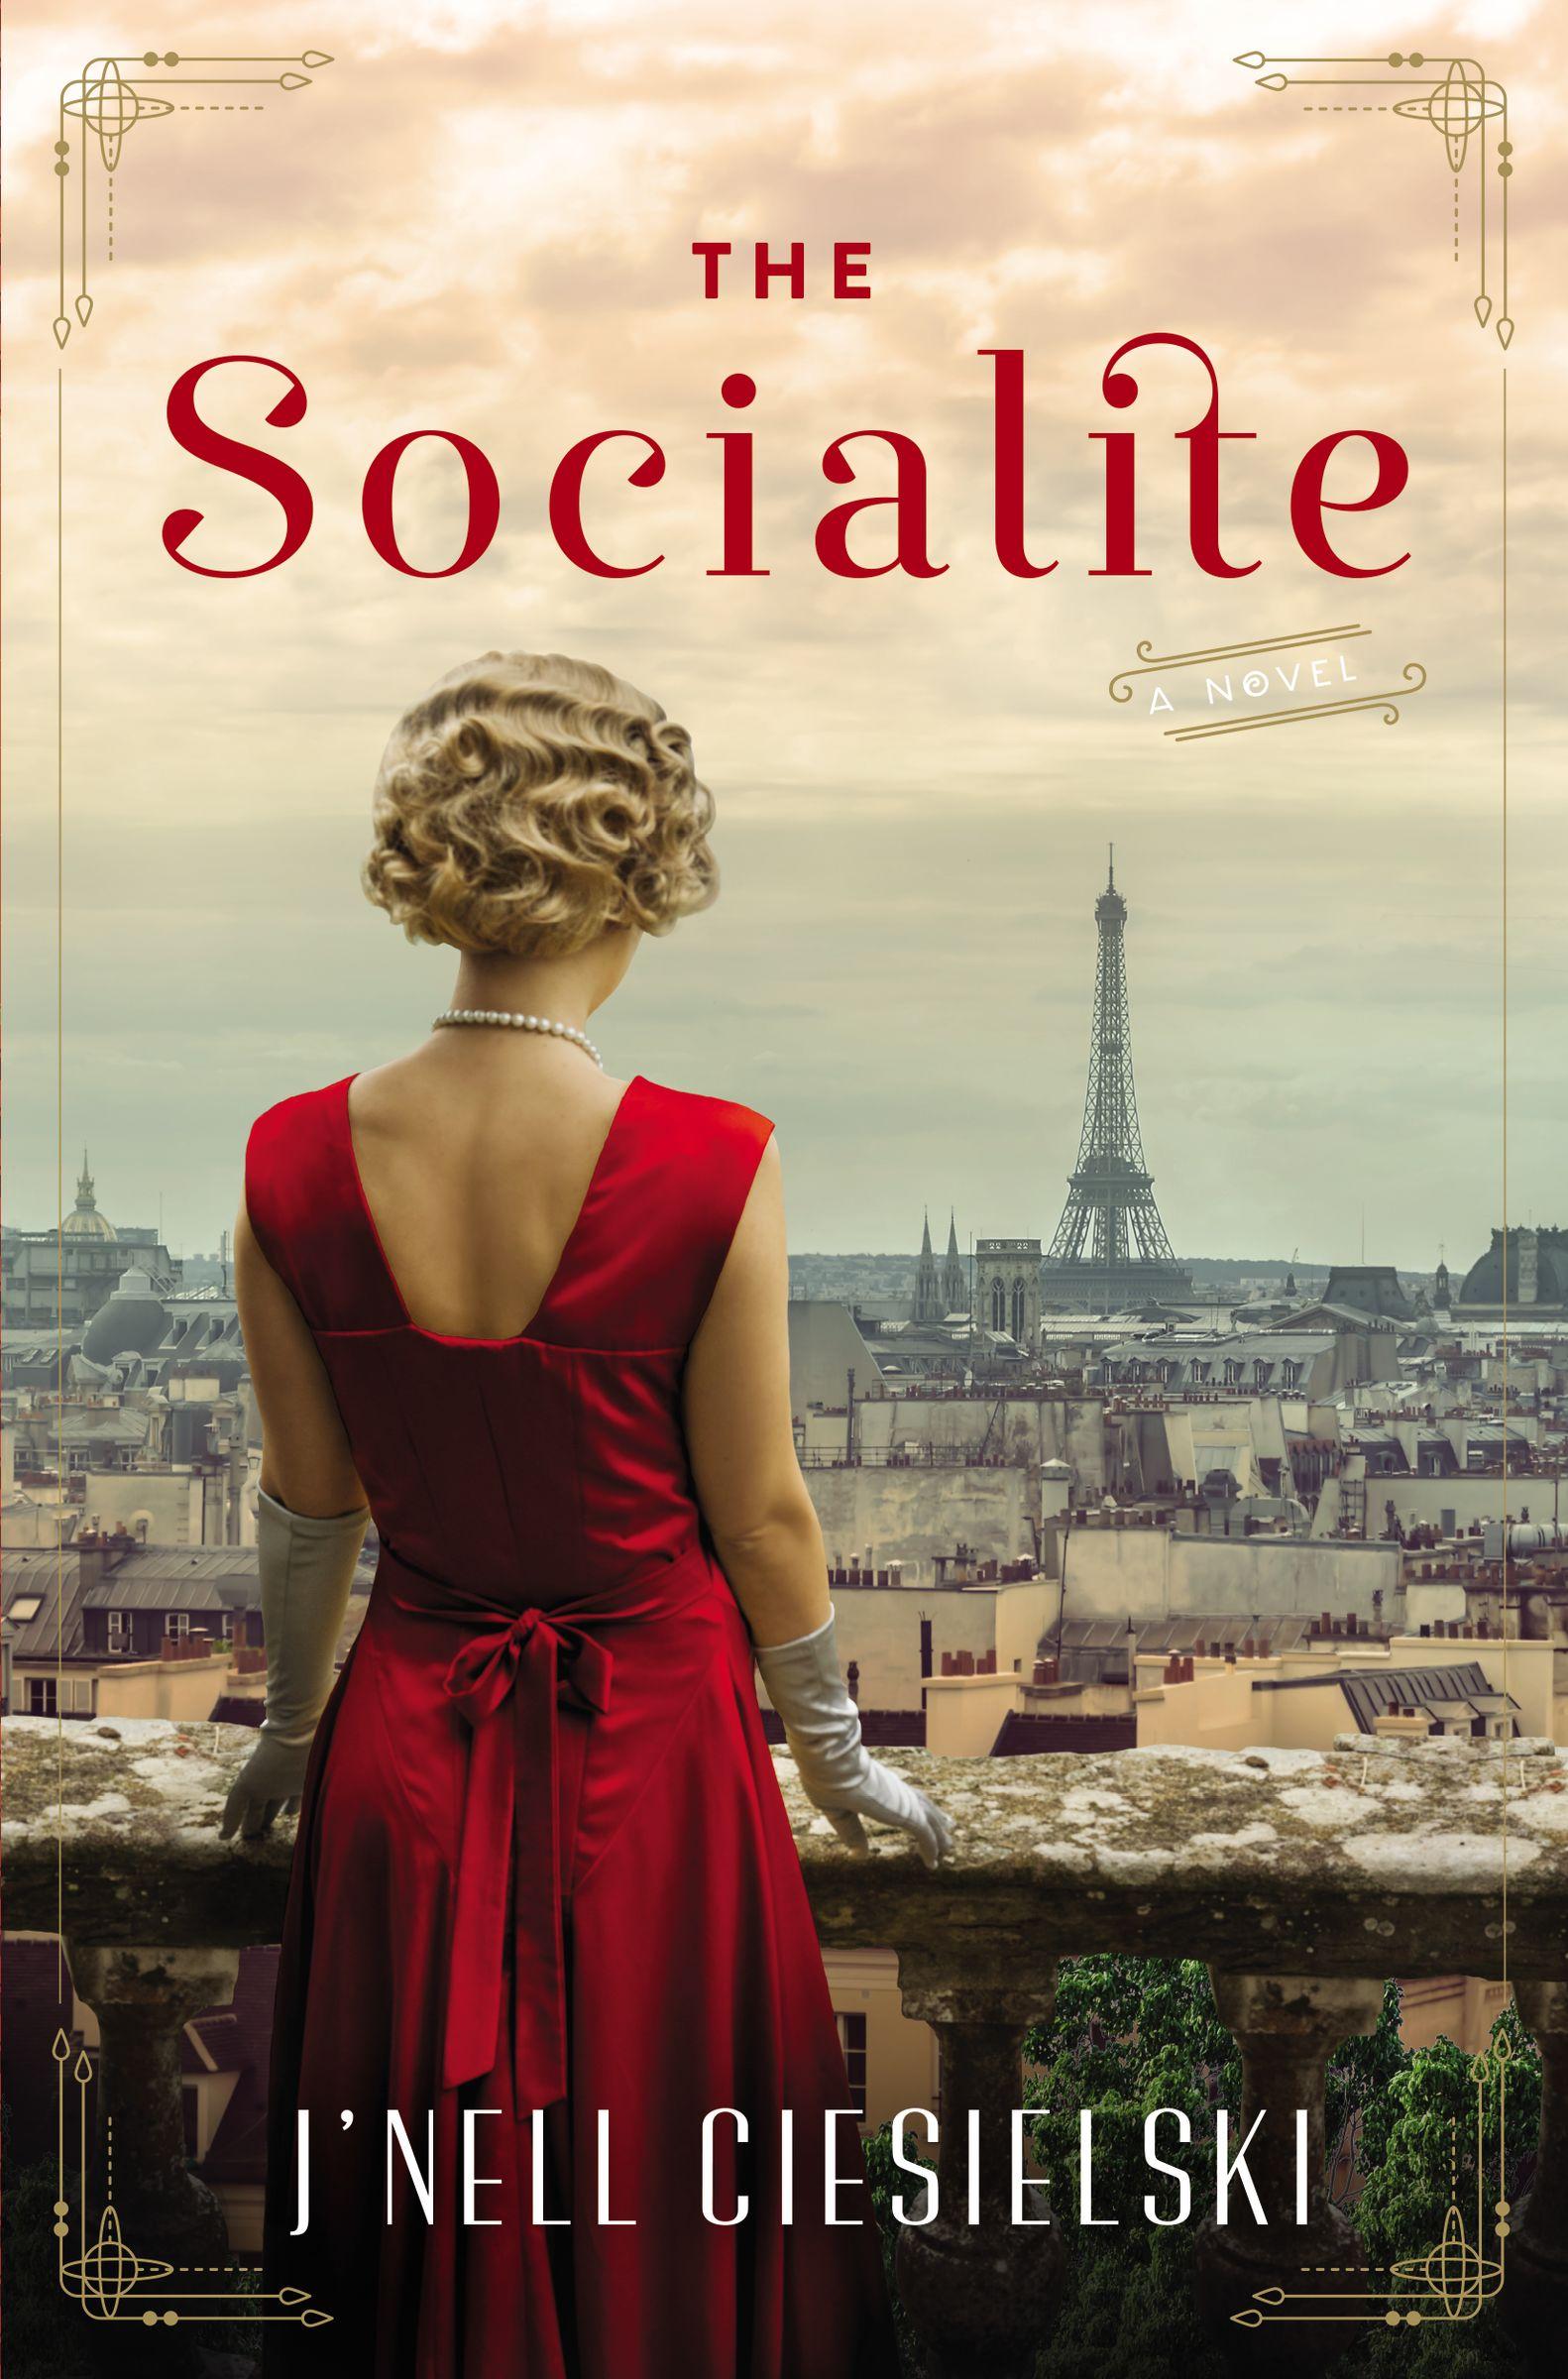 The Socialite - J'nell Ciesielski